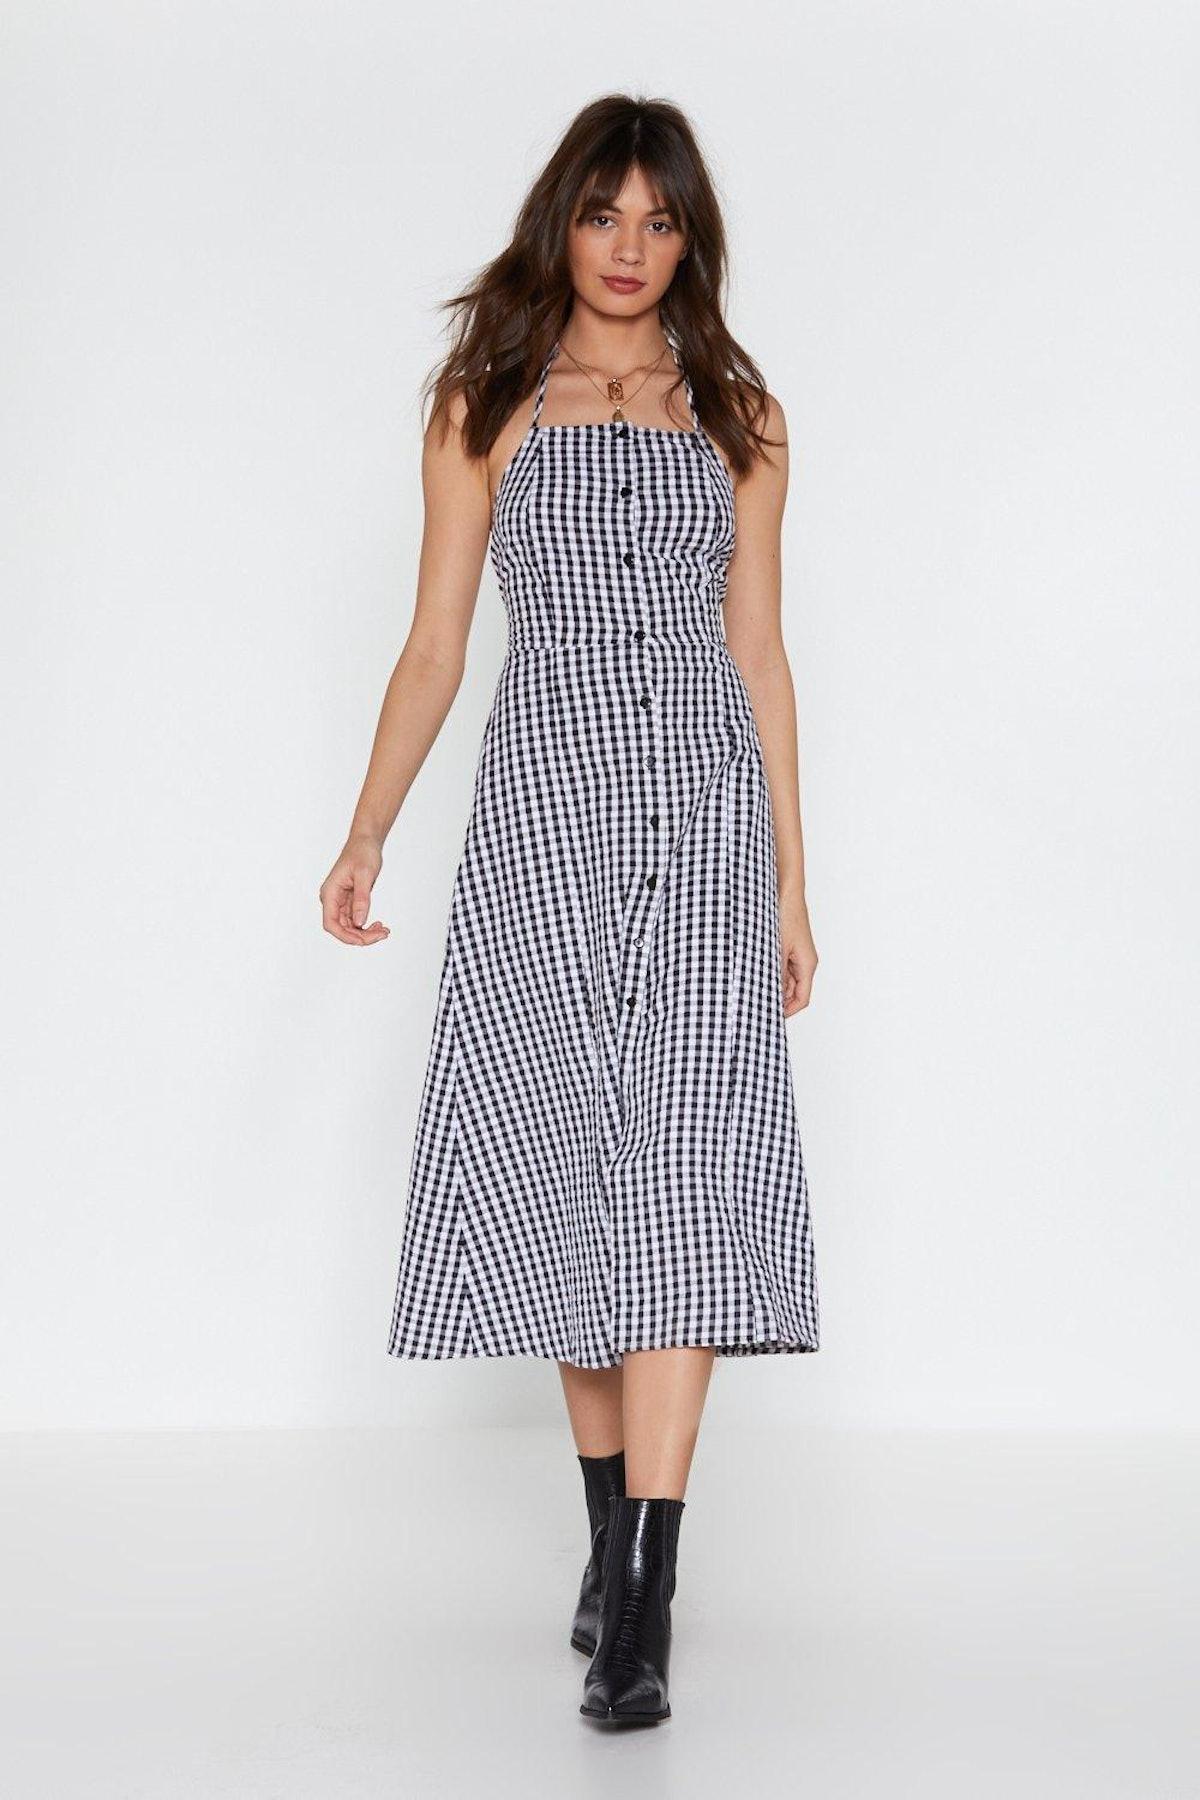 Hang in Square Gingham Halter Dress